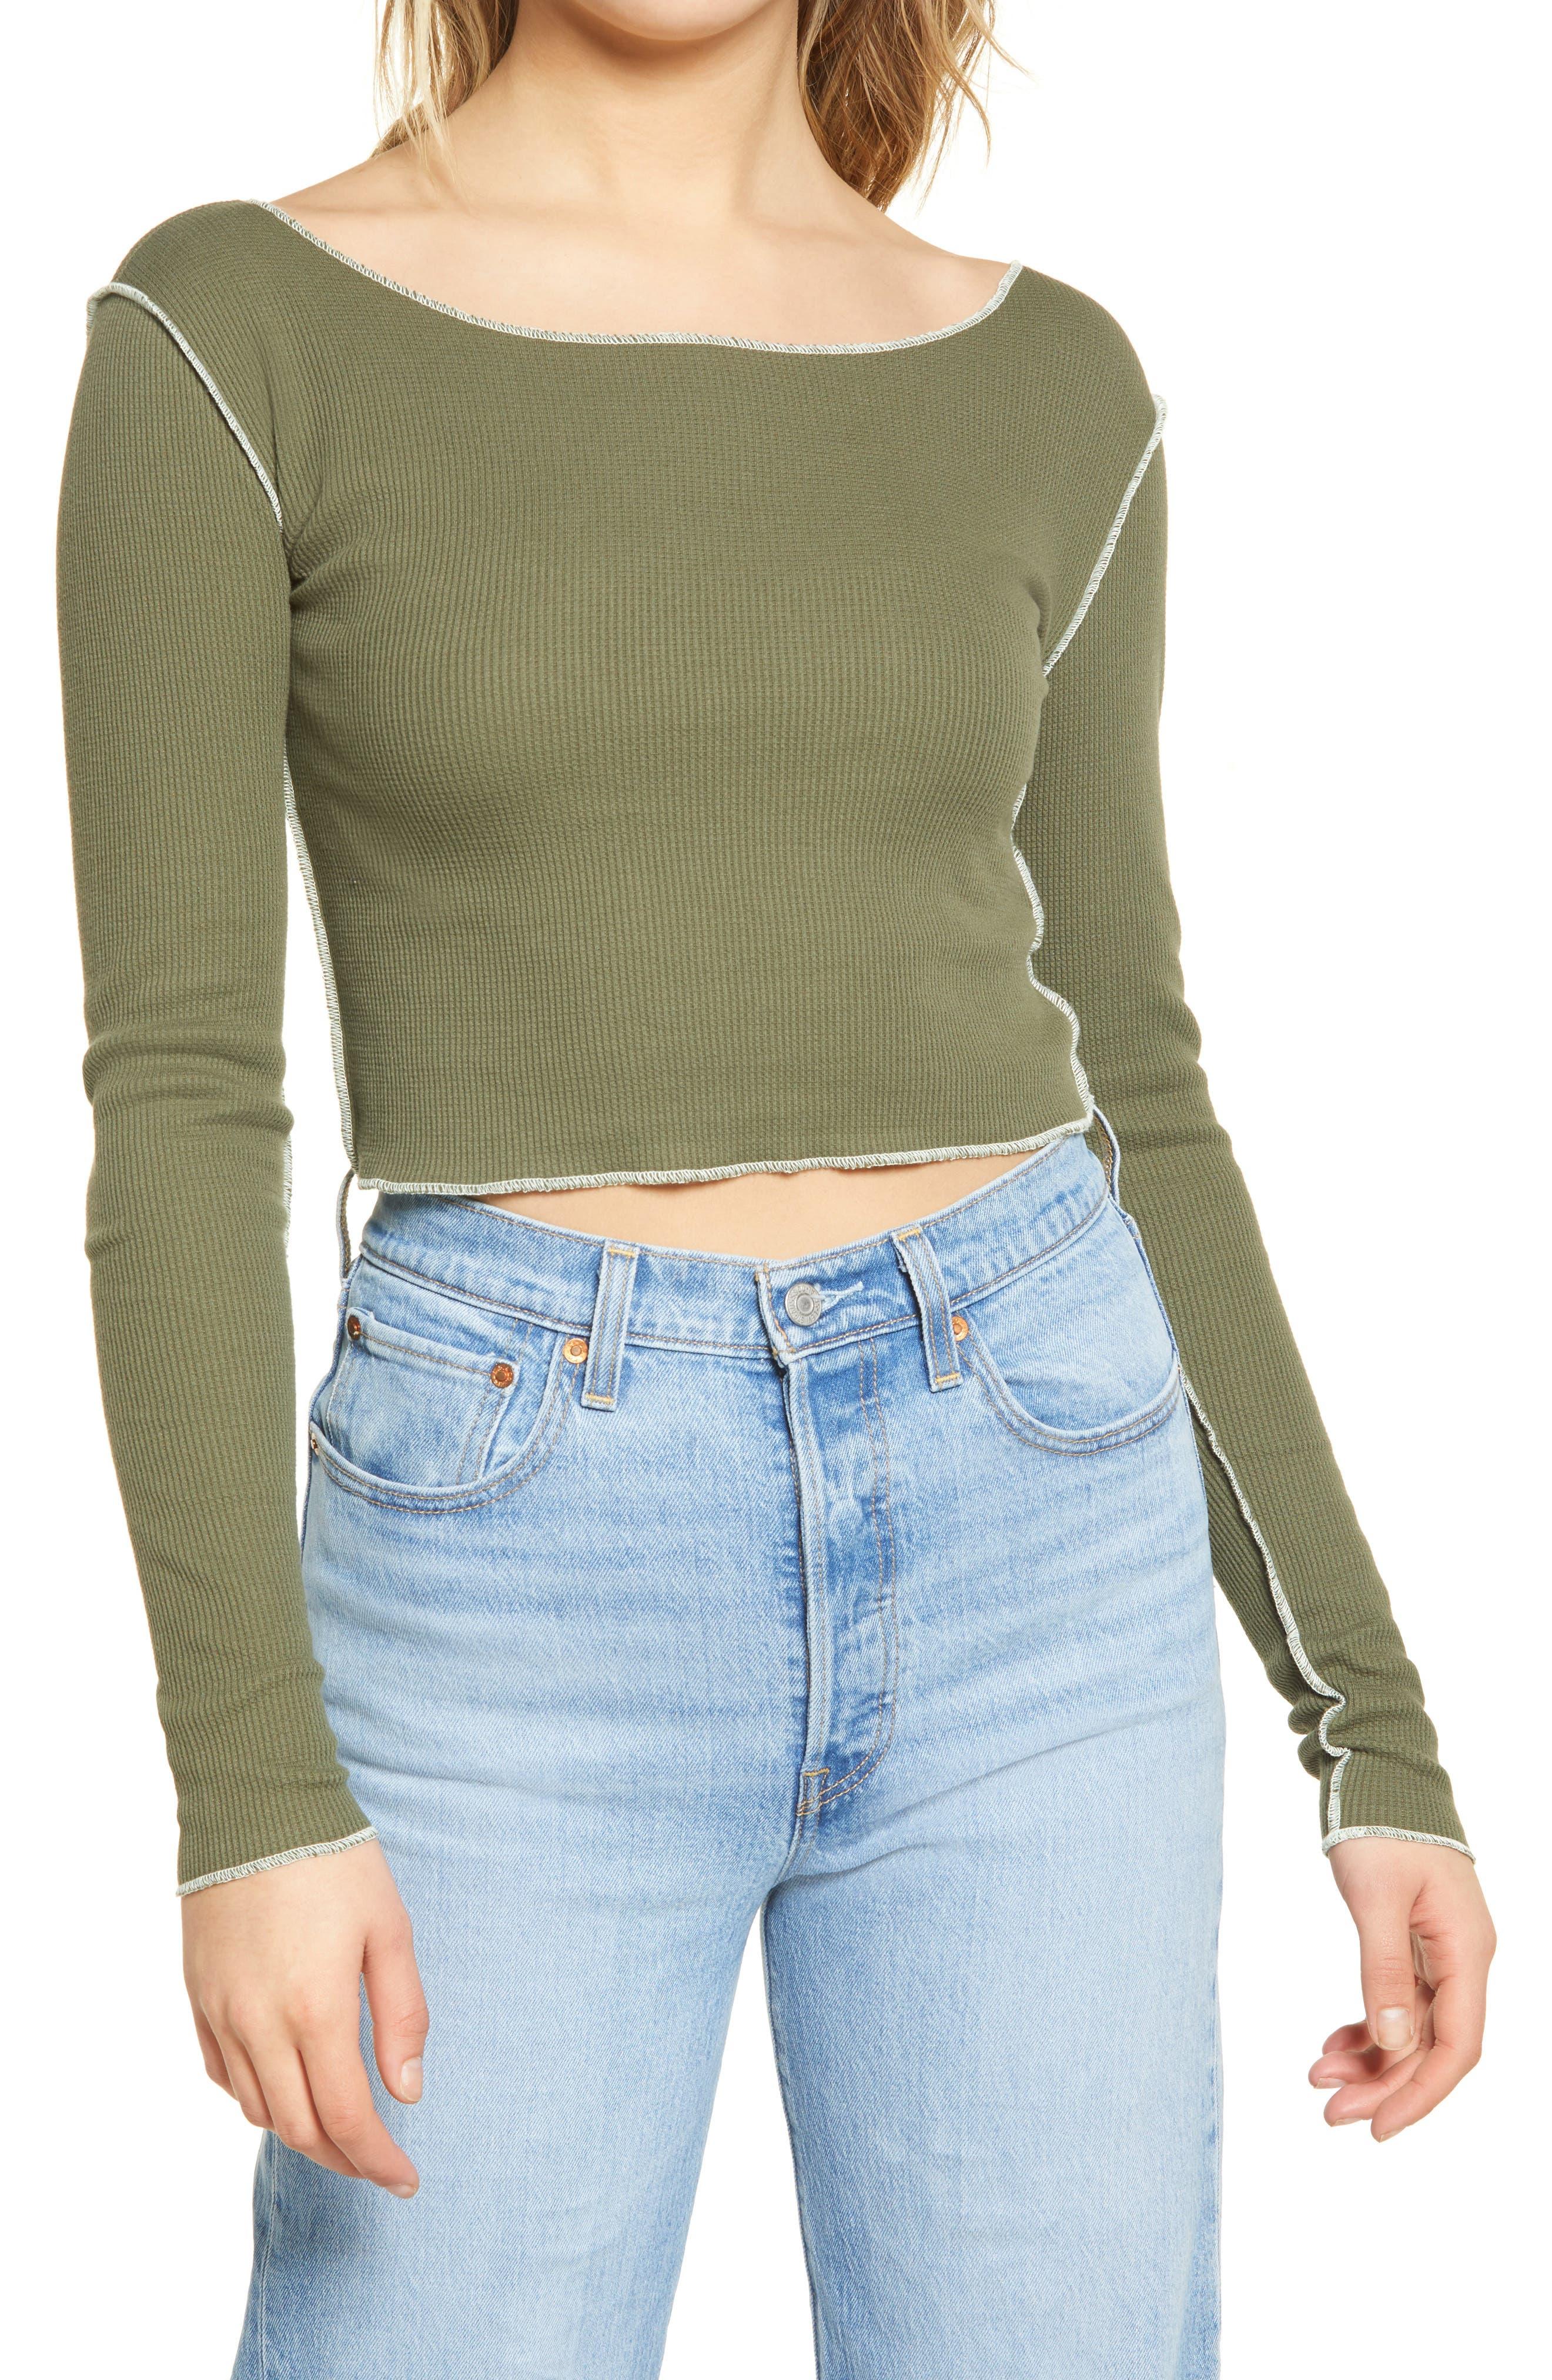 Palm Ladies//Womens Stylish Brushed Side Seam Free Thermal Short Sleeve Vest